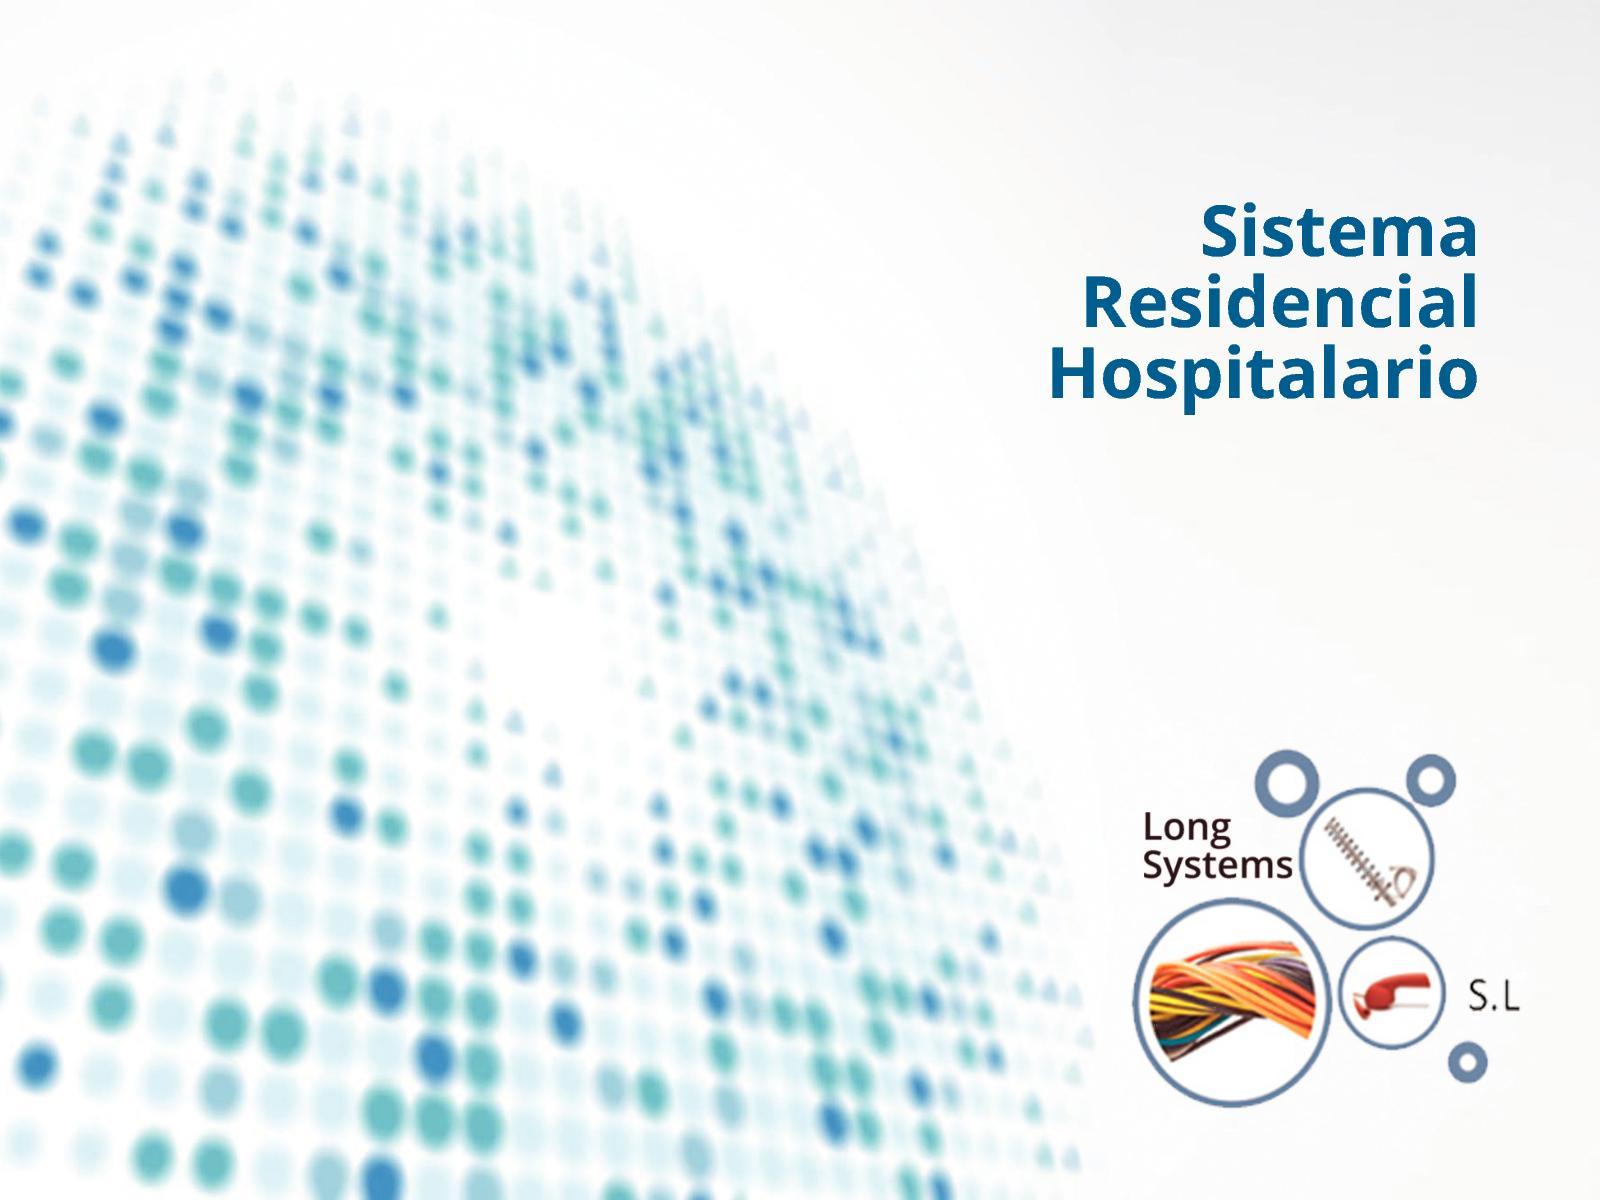 SISTEMA RESIDENCIAL HOSPITALARIO